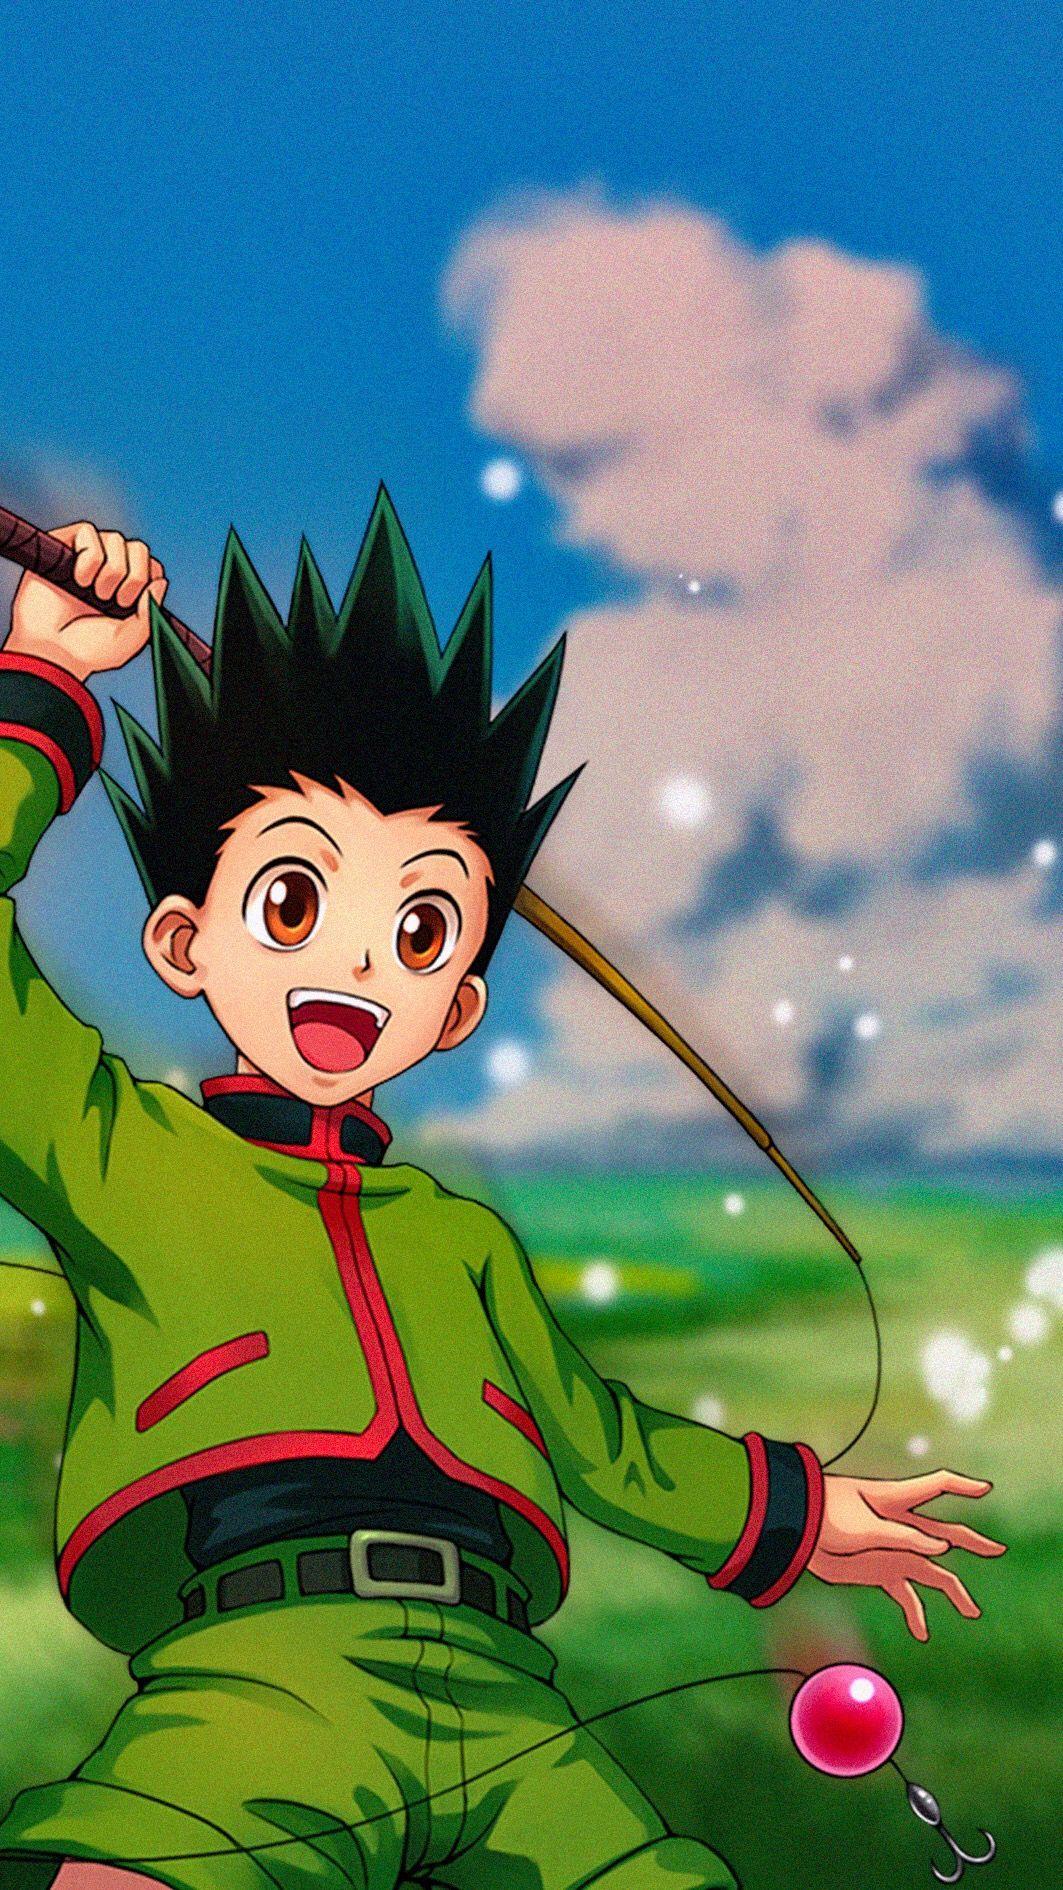 Gon Freecss In 2020 Hunter Anime Hunter X Hunter Anime Christmas